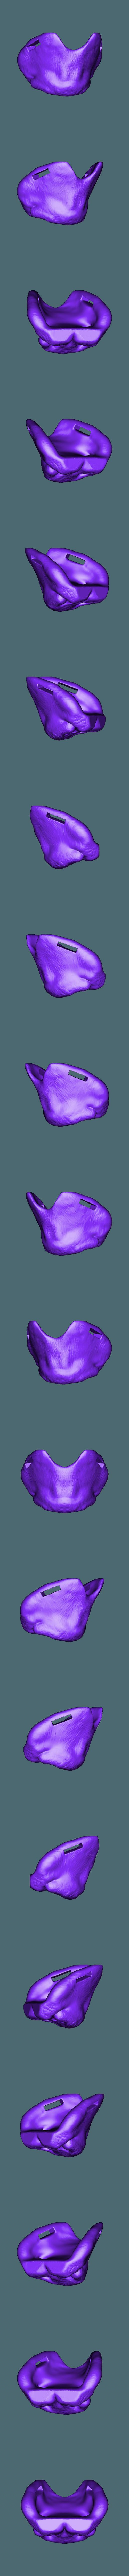 Dog_nose.stl Download free STL file Halloween Animal Nose Pack! • 3D printable object, DFB93